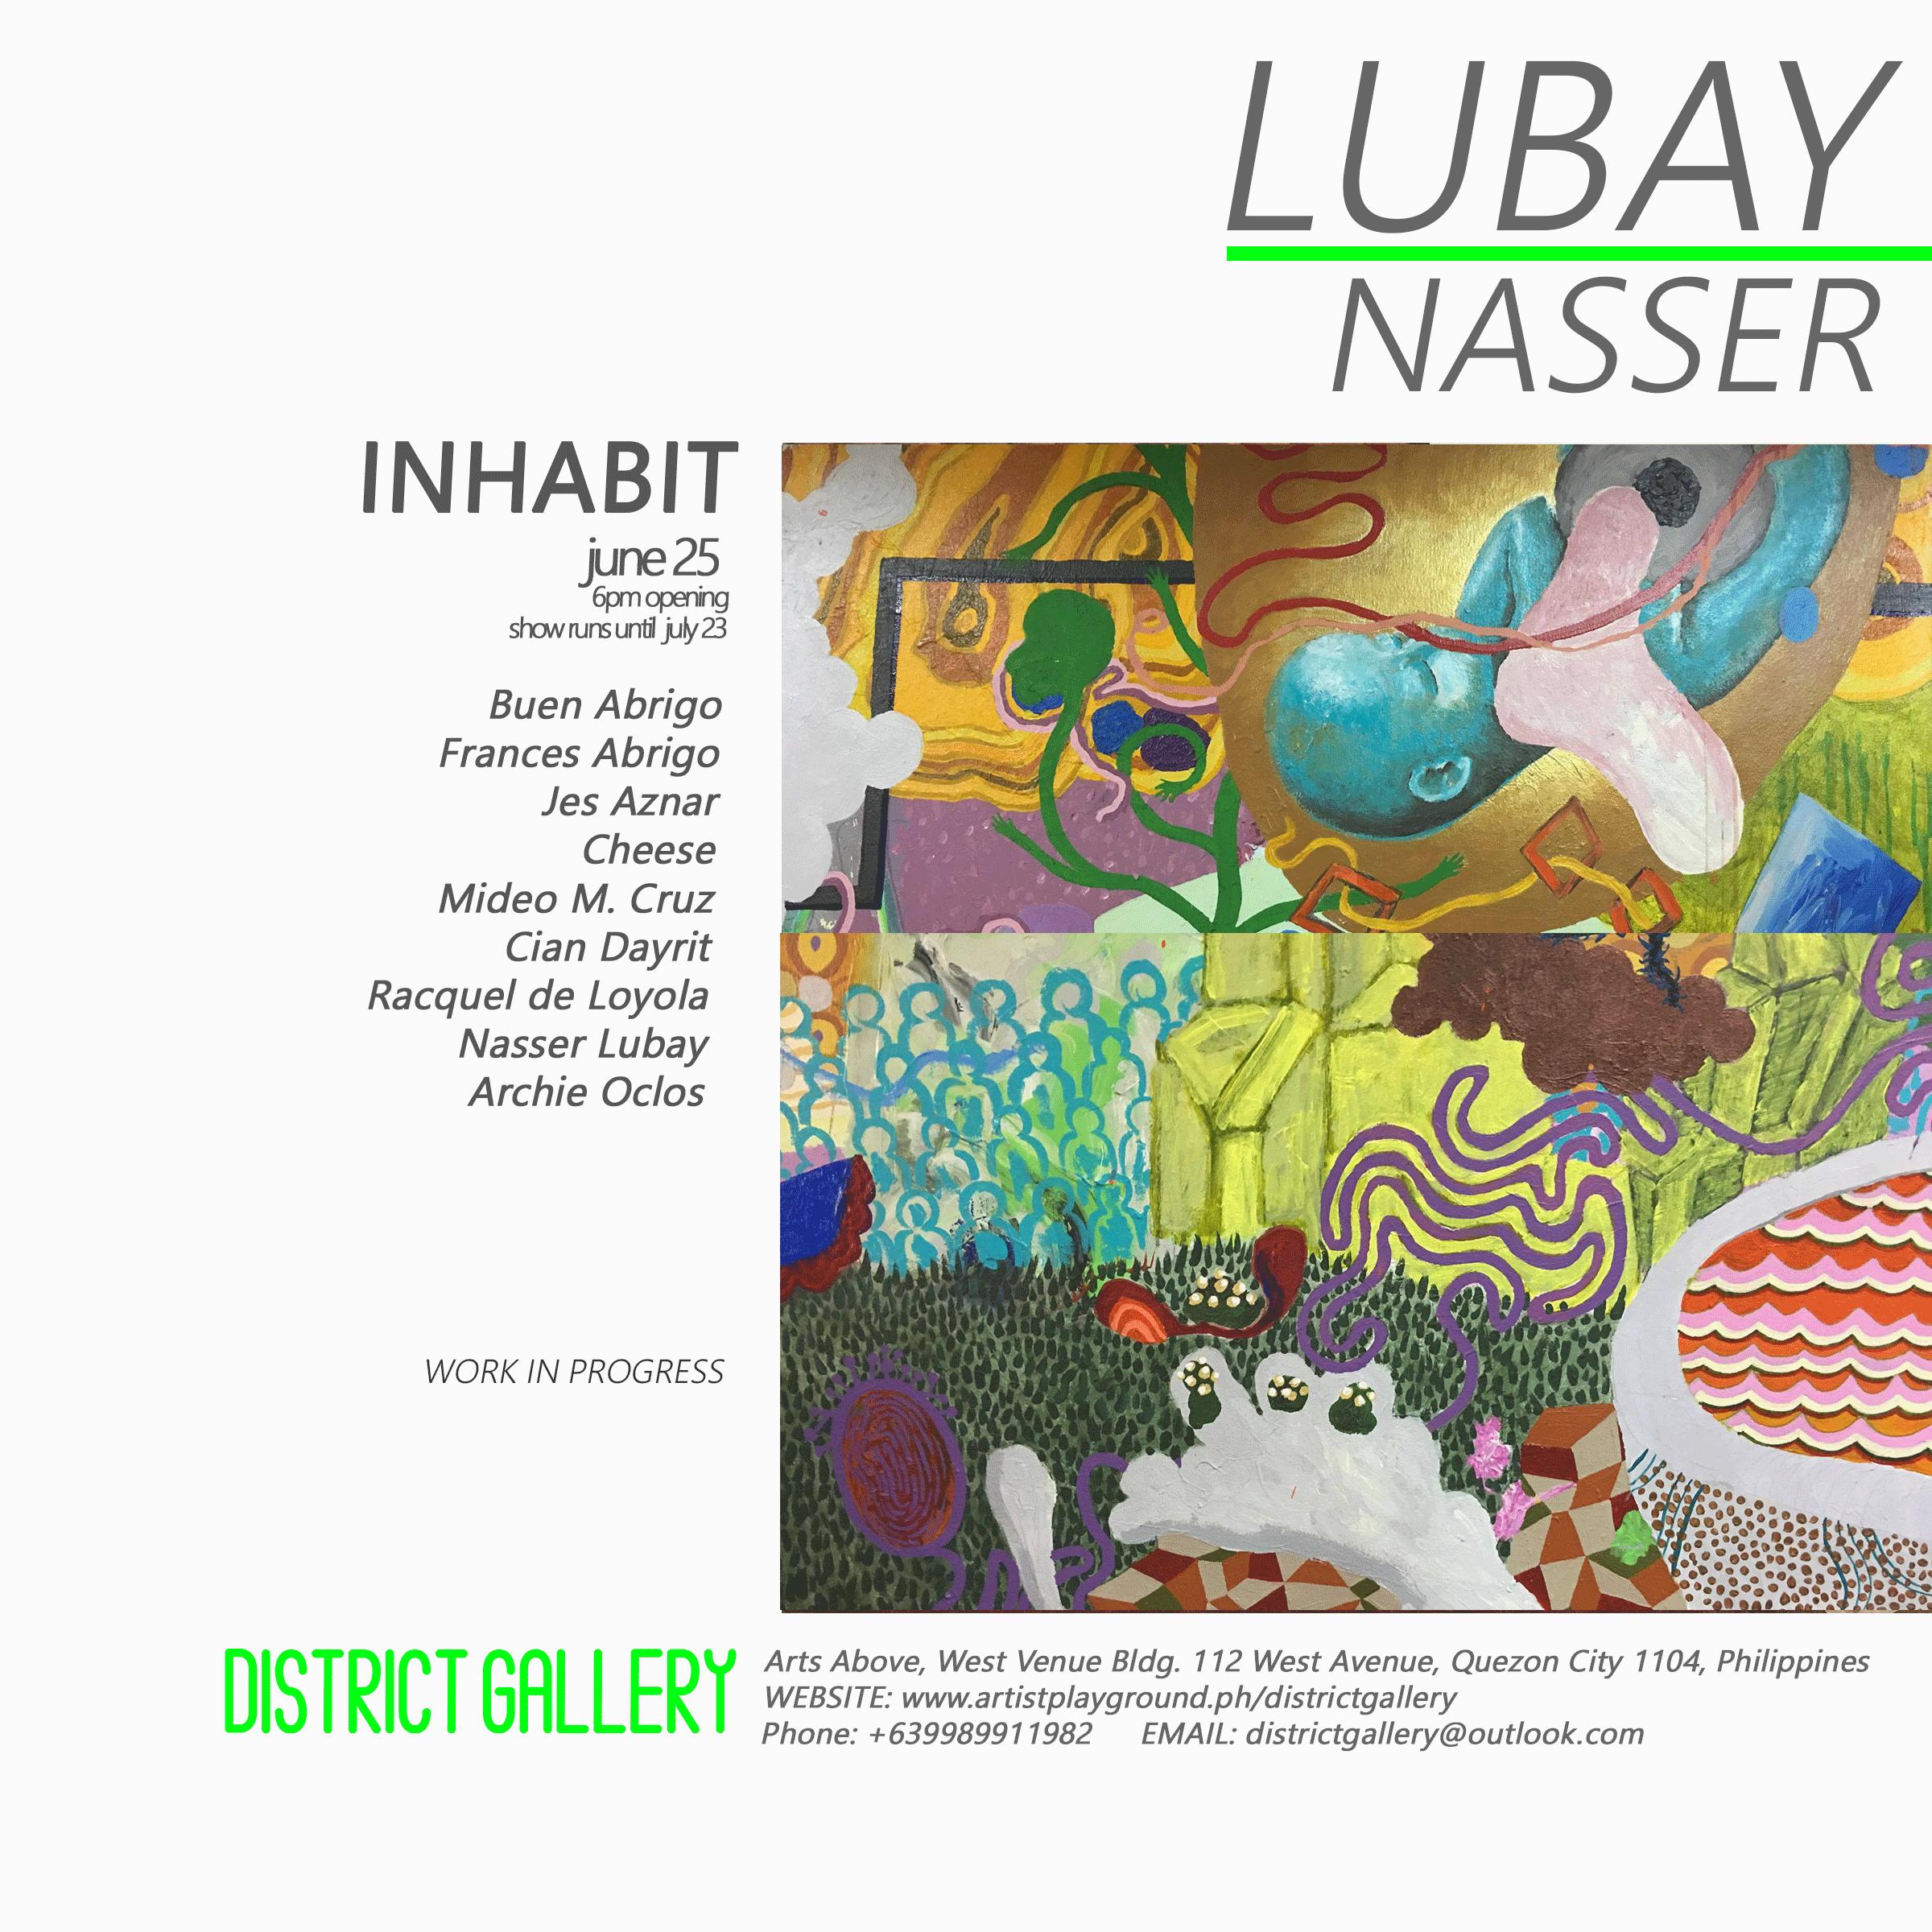 nasser-lubay-inhabit.png